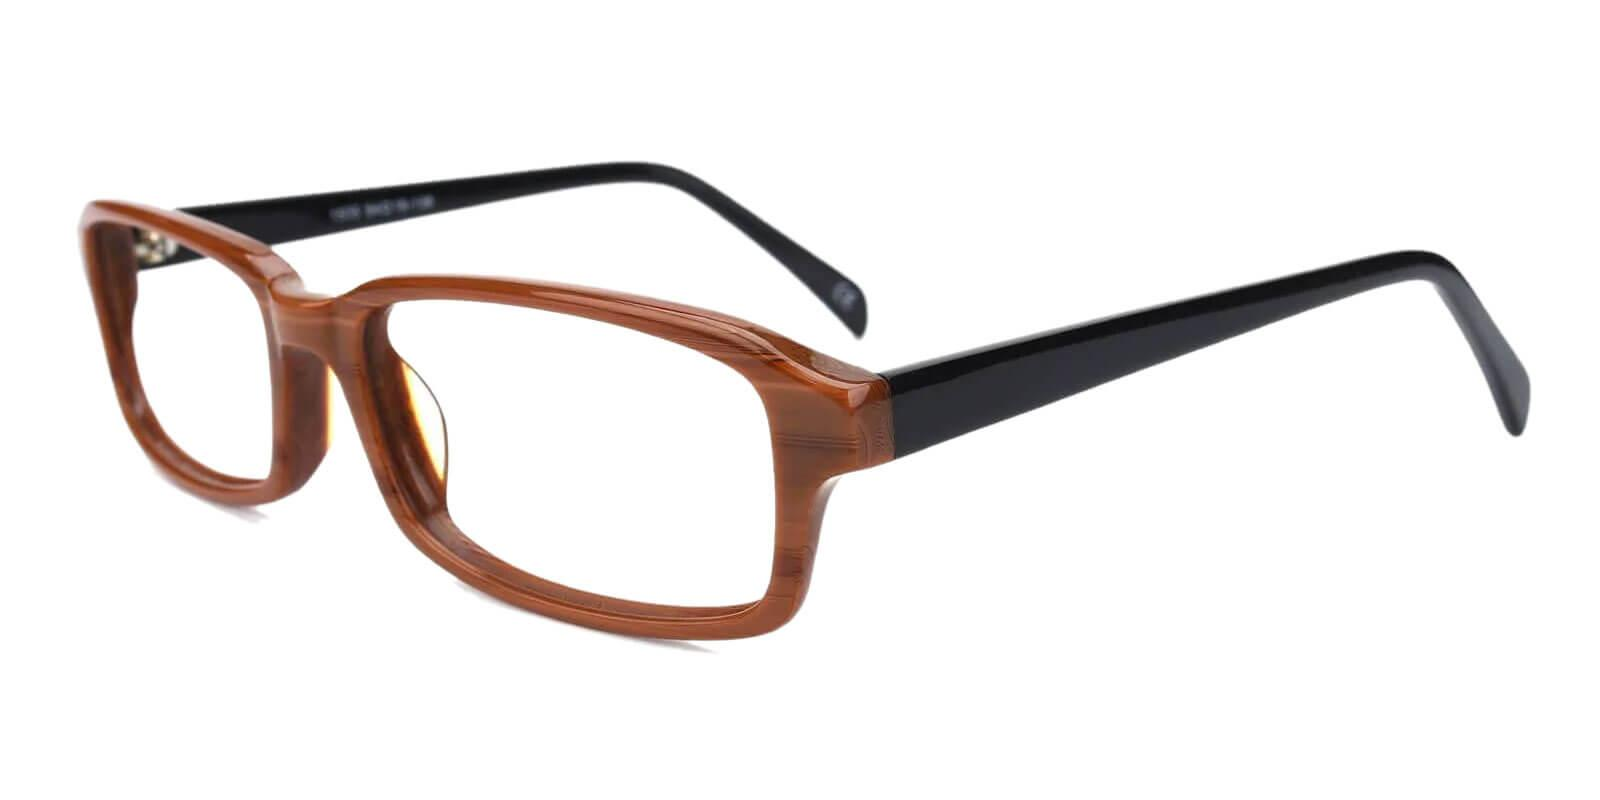 Altus Brown Acetate Eyeglasses , UniversalBridgeFit Frames from ABBE Glasses